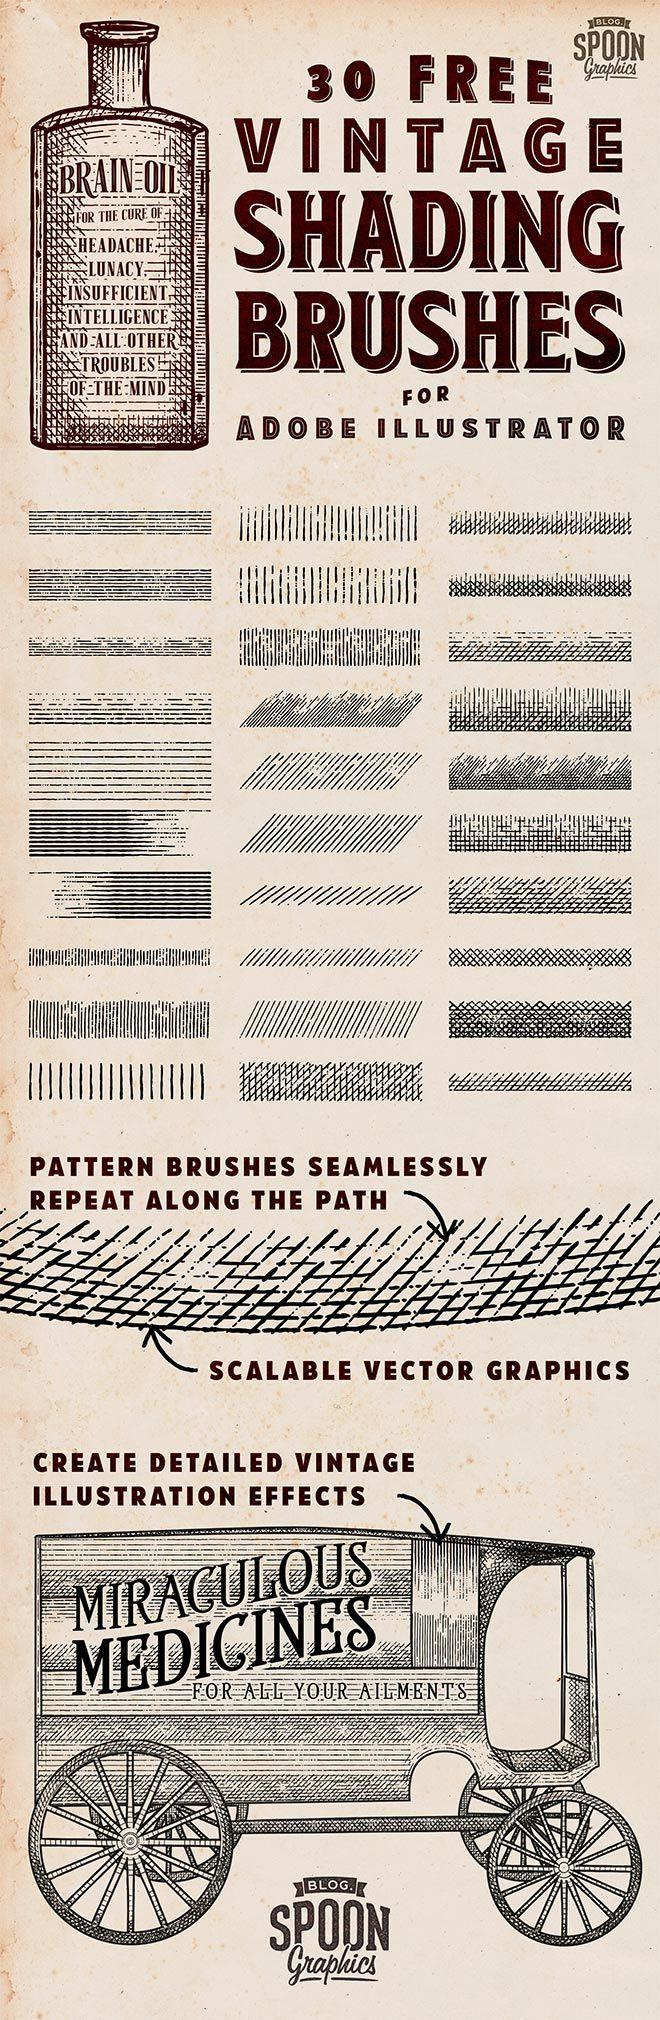 30 Free Vintage Shading Brushes For Adobe Illustrator Kresleni